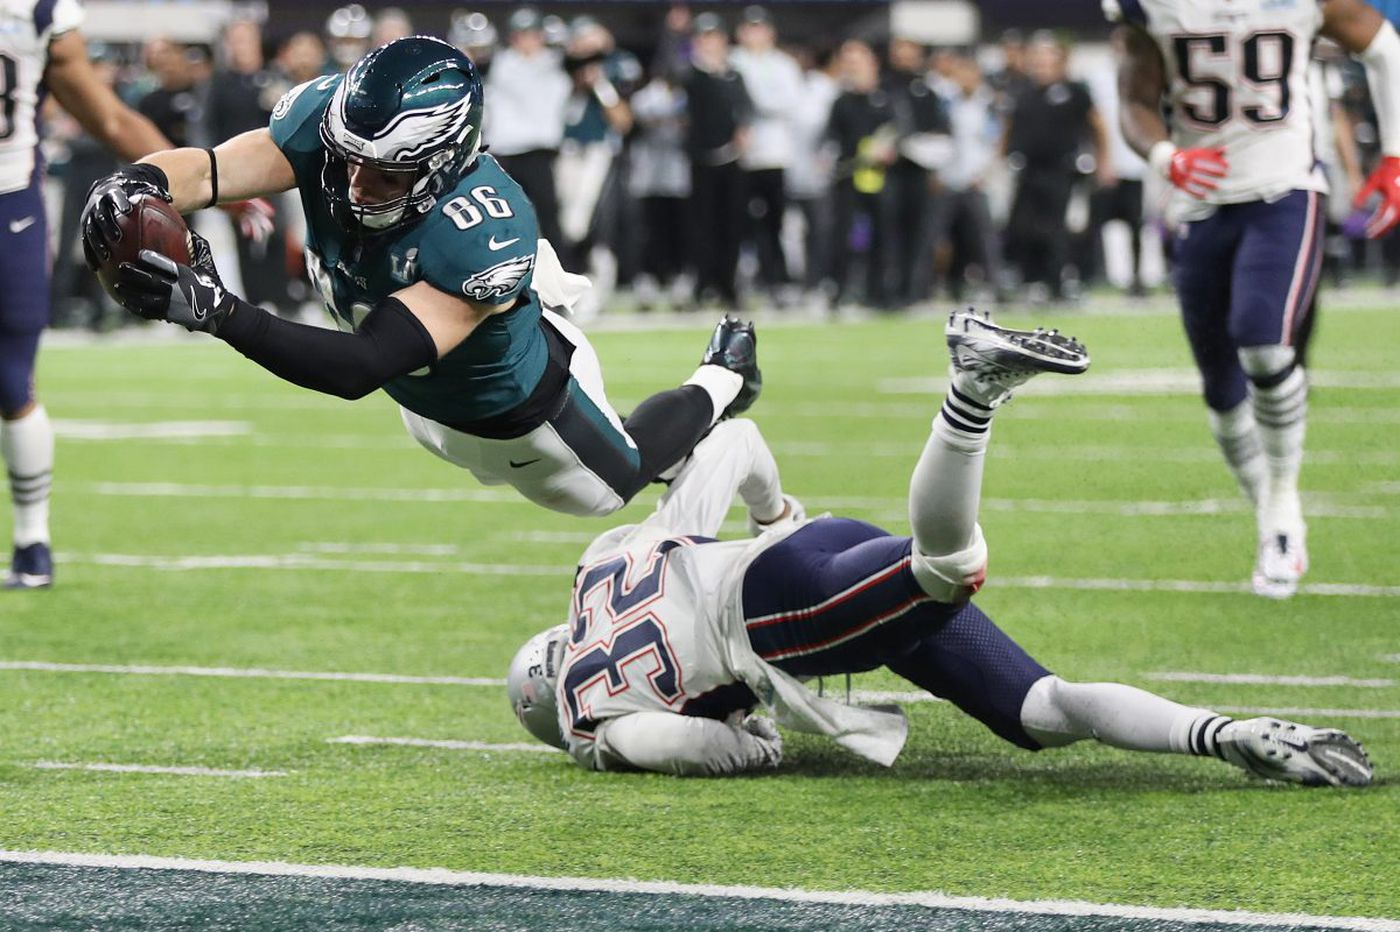 d79b2572c33 Zach Ertz and the touchdown that won the Eagles the Super Bowl